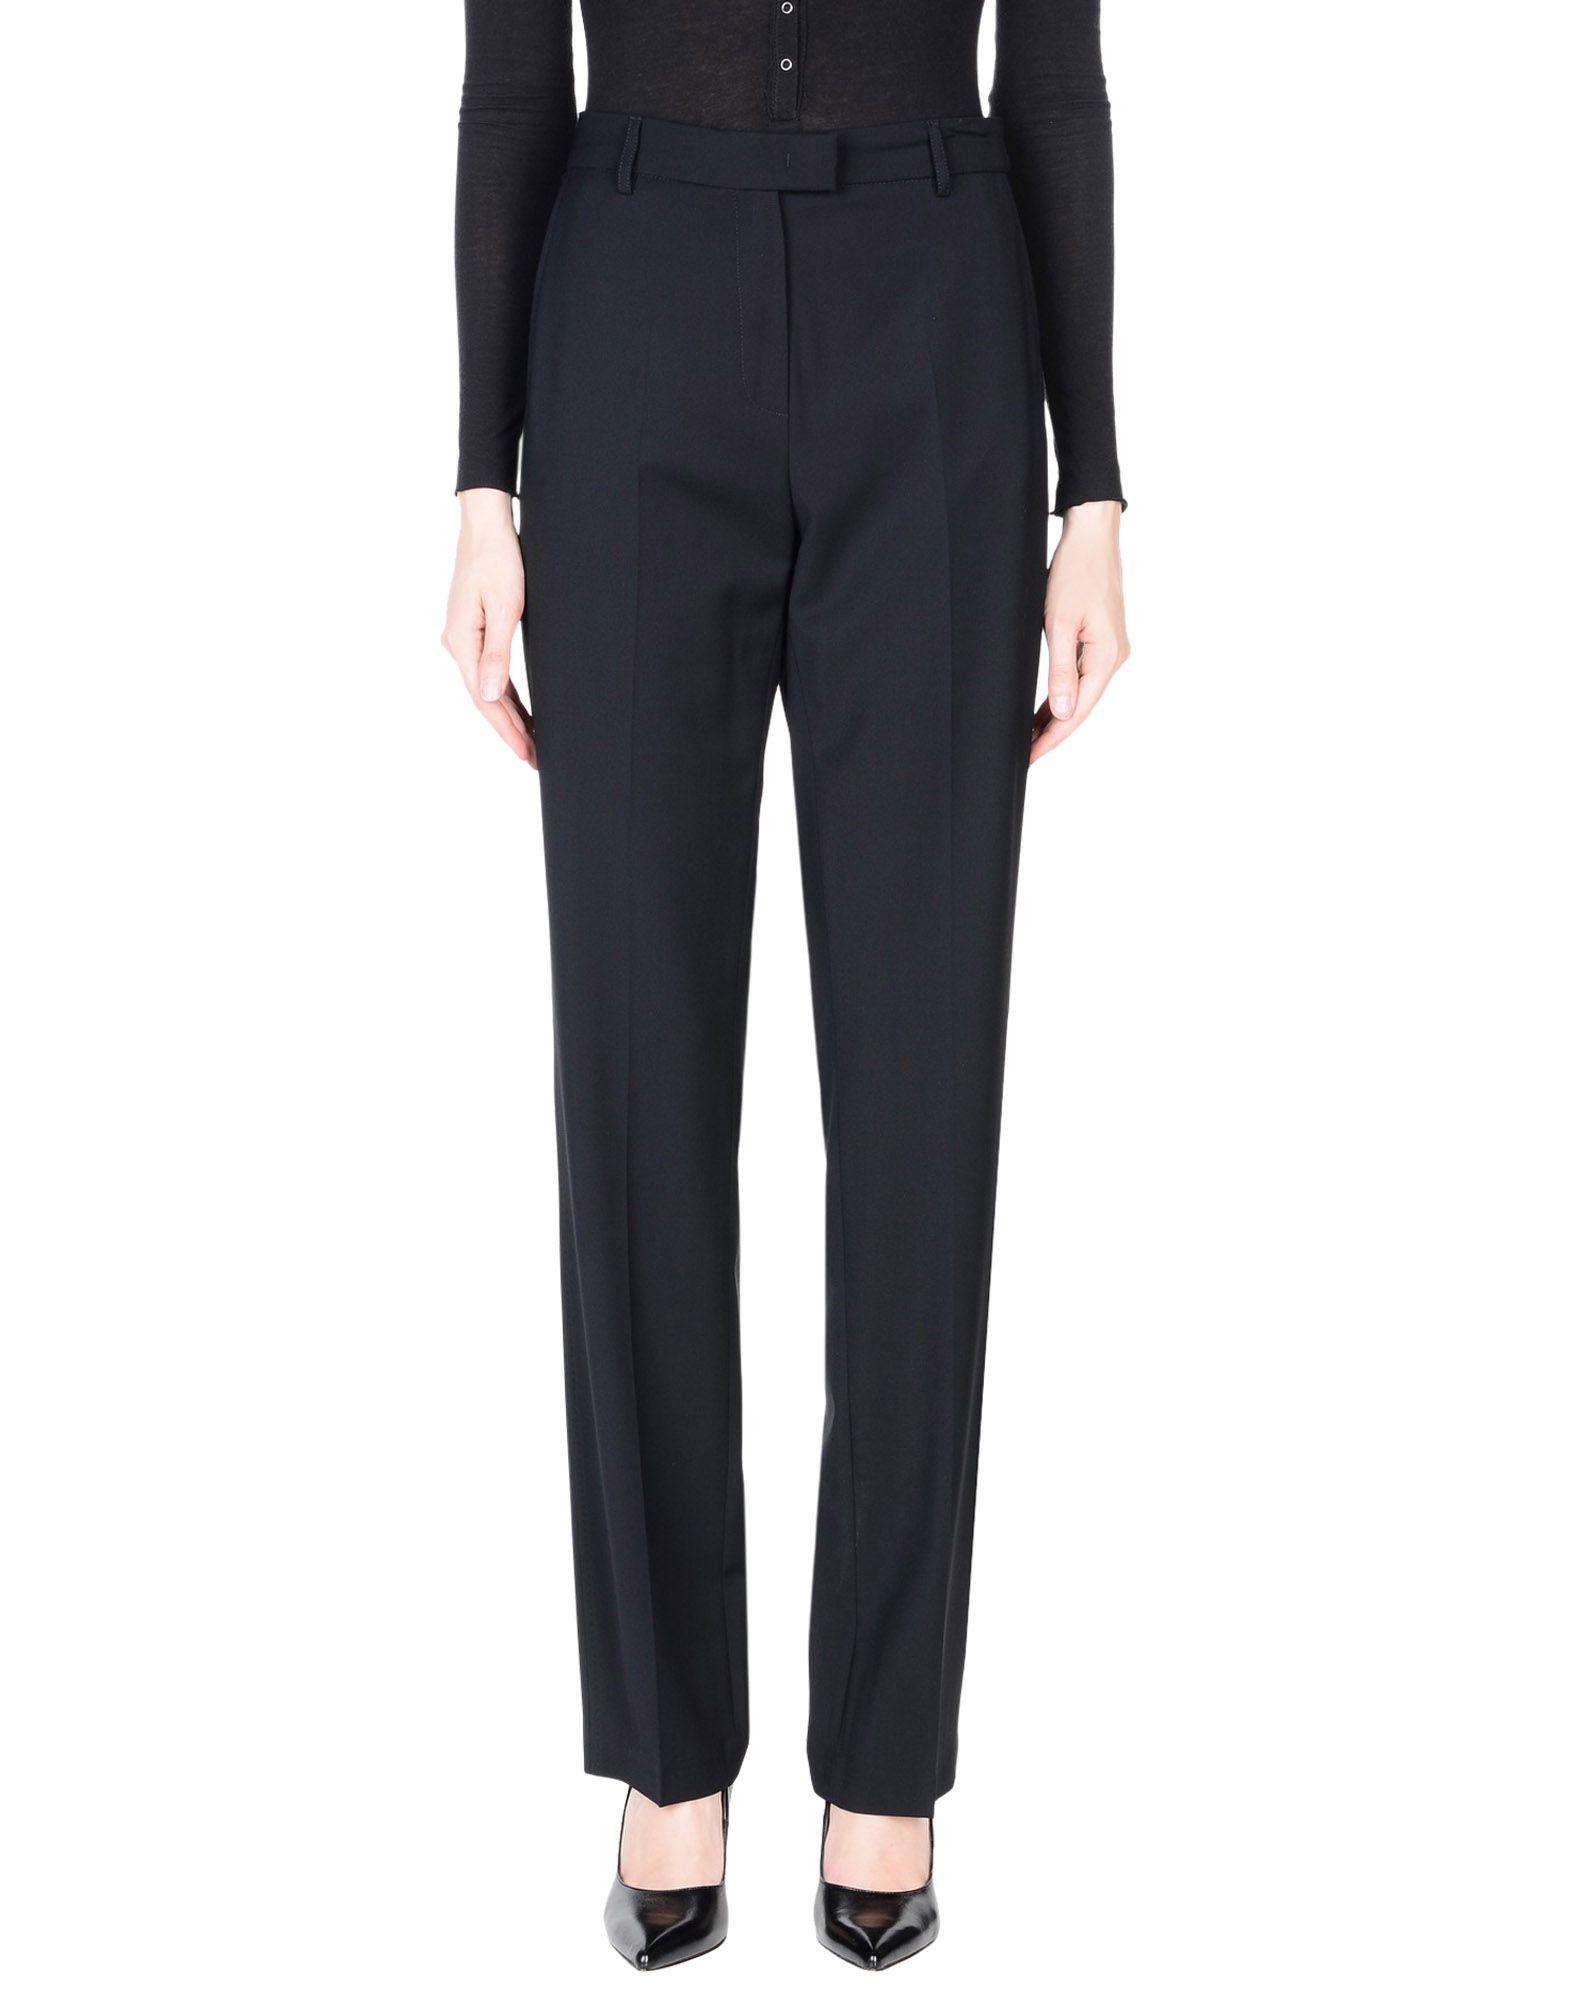 SEDUCTIVE Casual Pants in Black